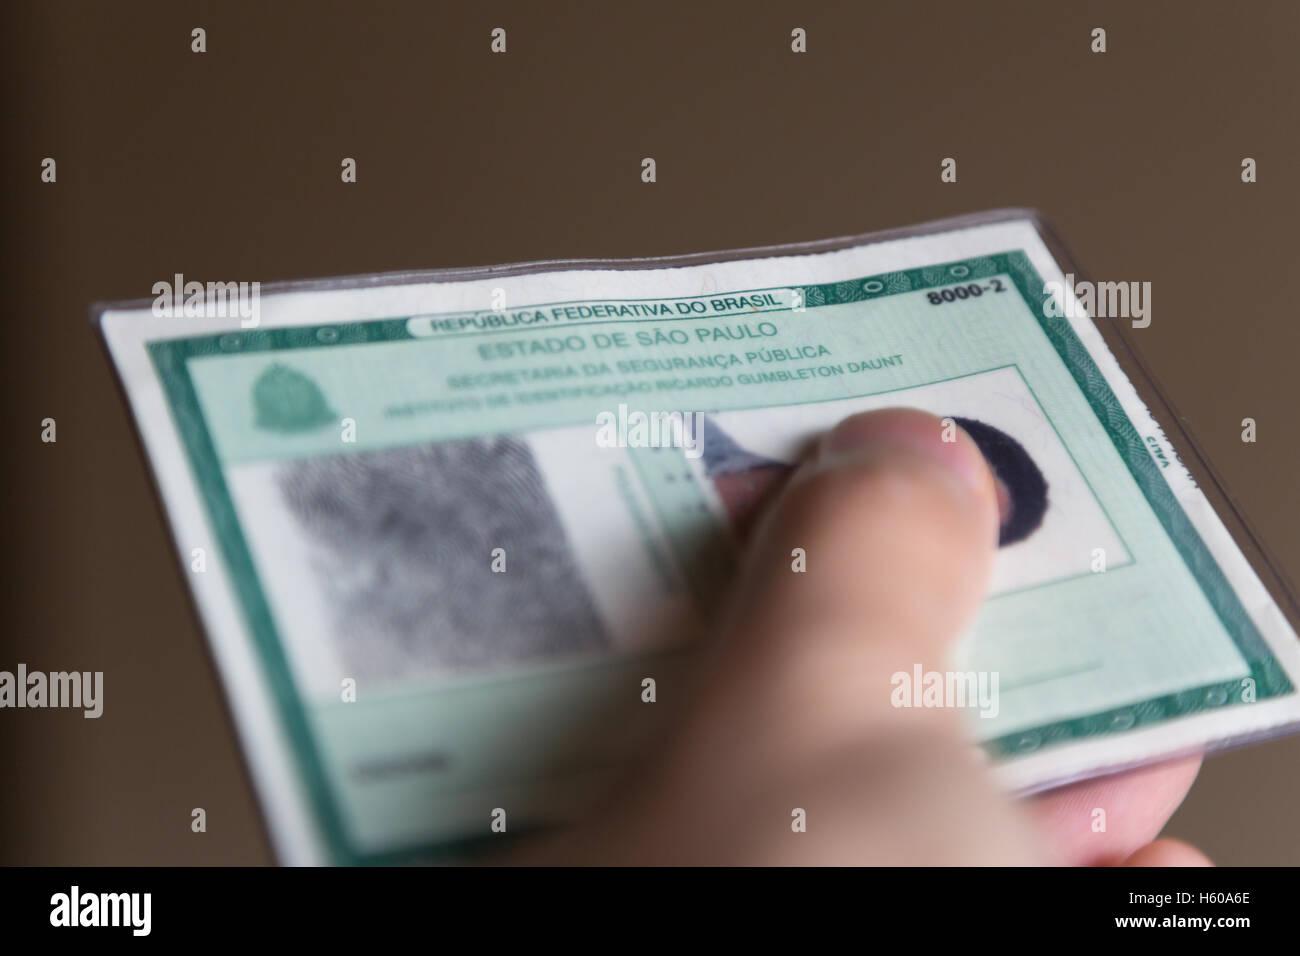 Carte Identite Bresil.Part Detient Une Carteira De Identidade Carte D Identite